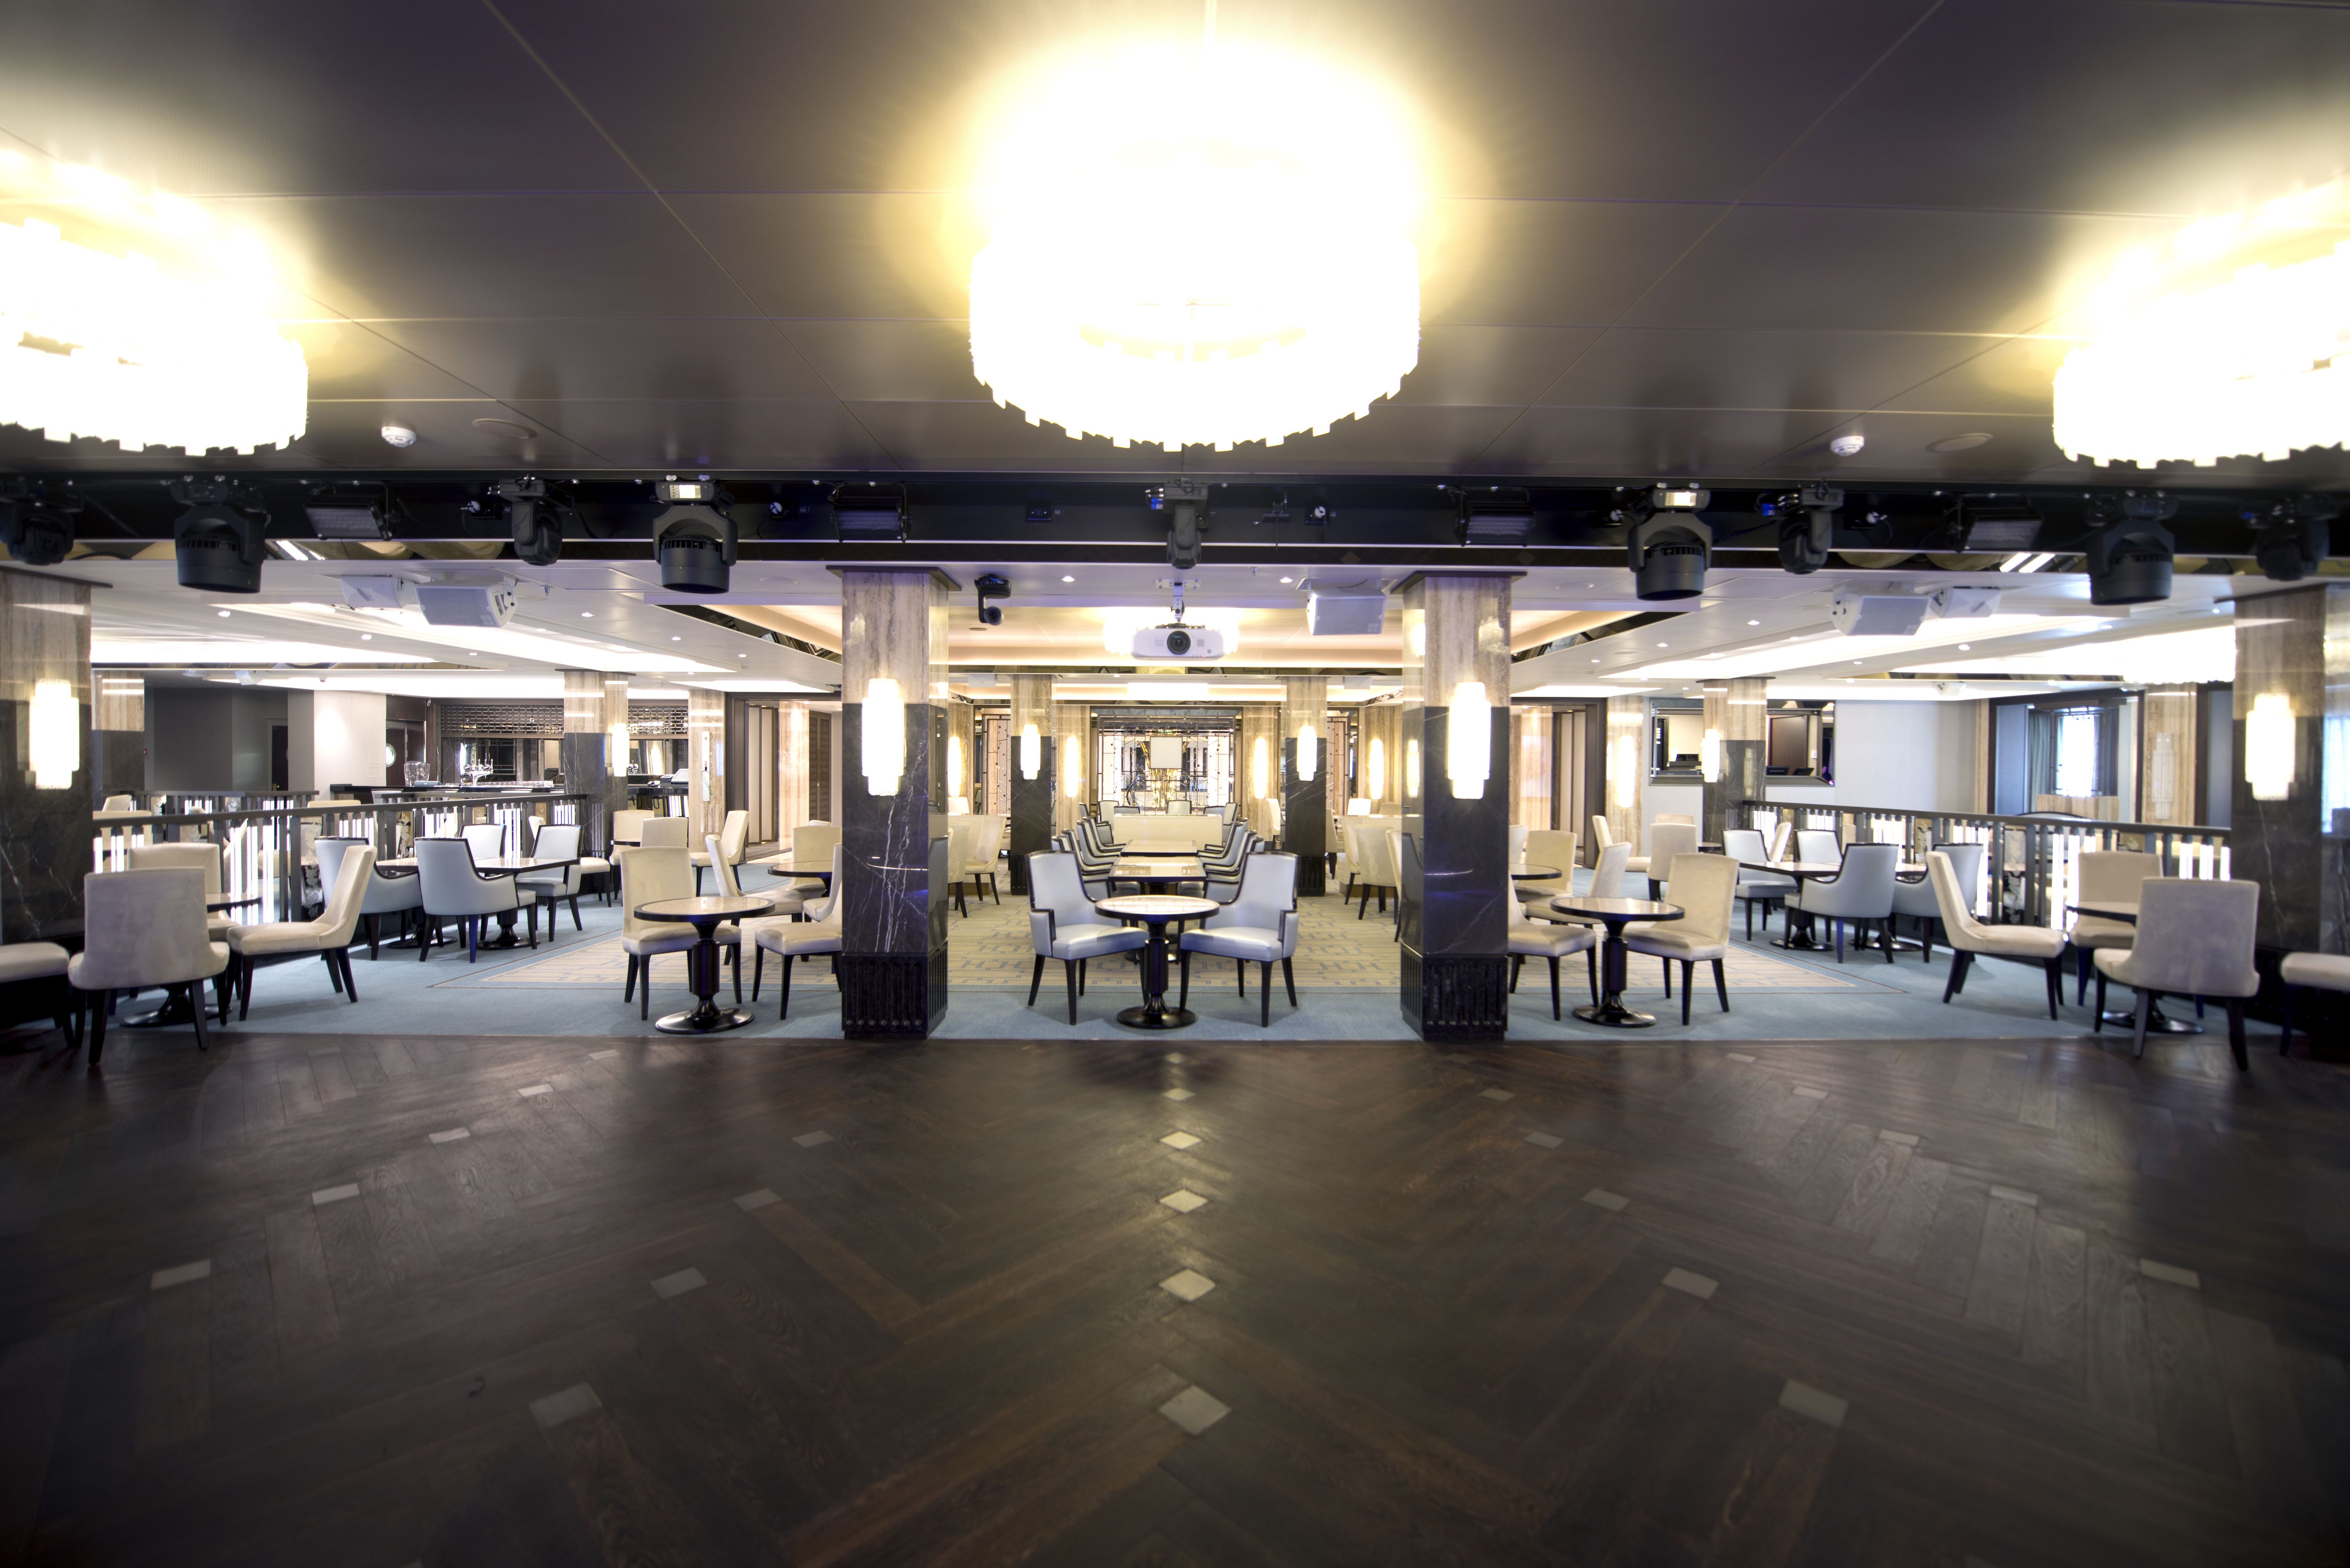 P&O Cruises Britannia Interior Crystal Room D806807 [Tif 14714596202].jpg